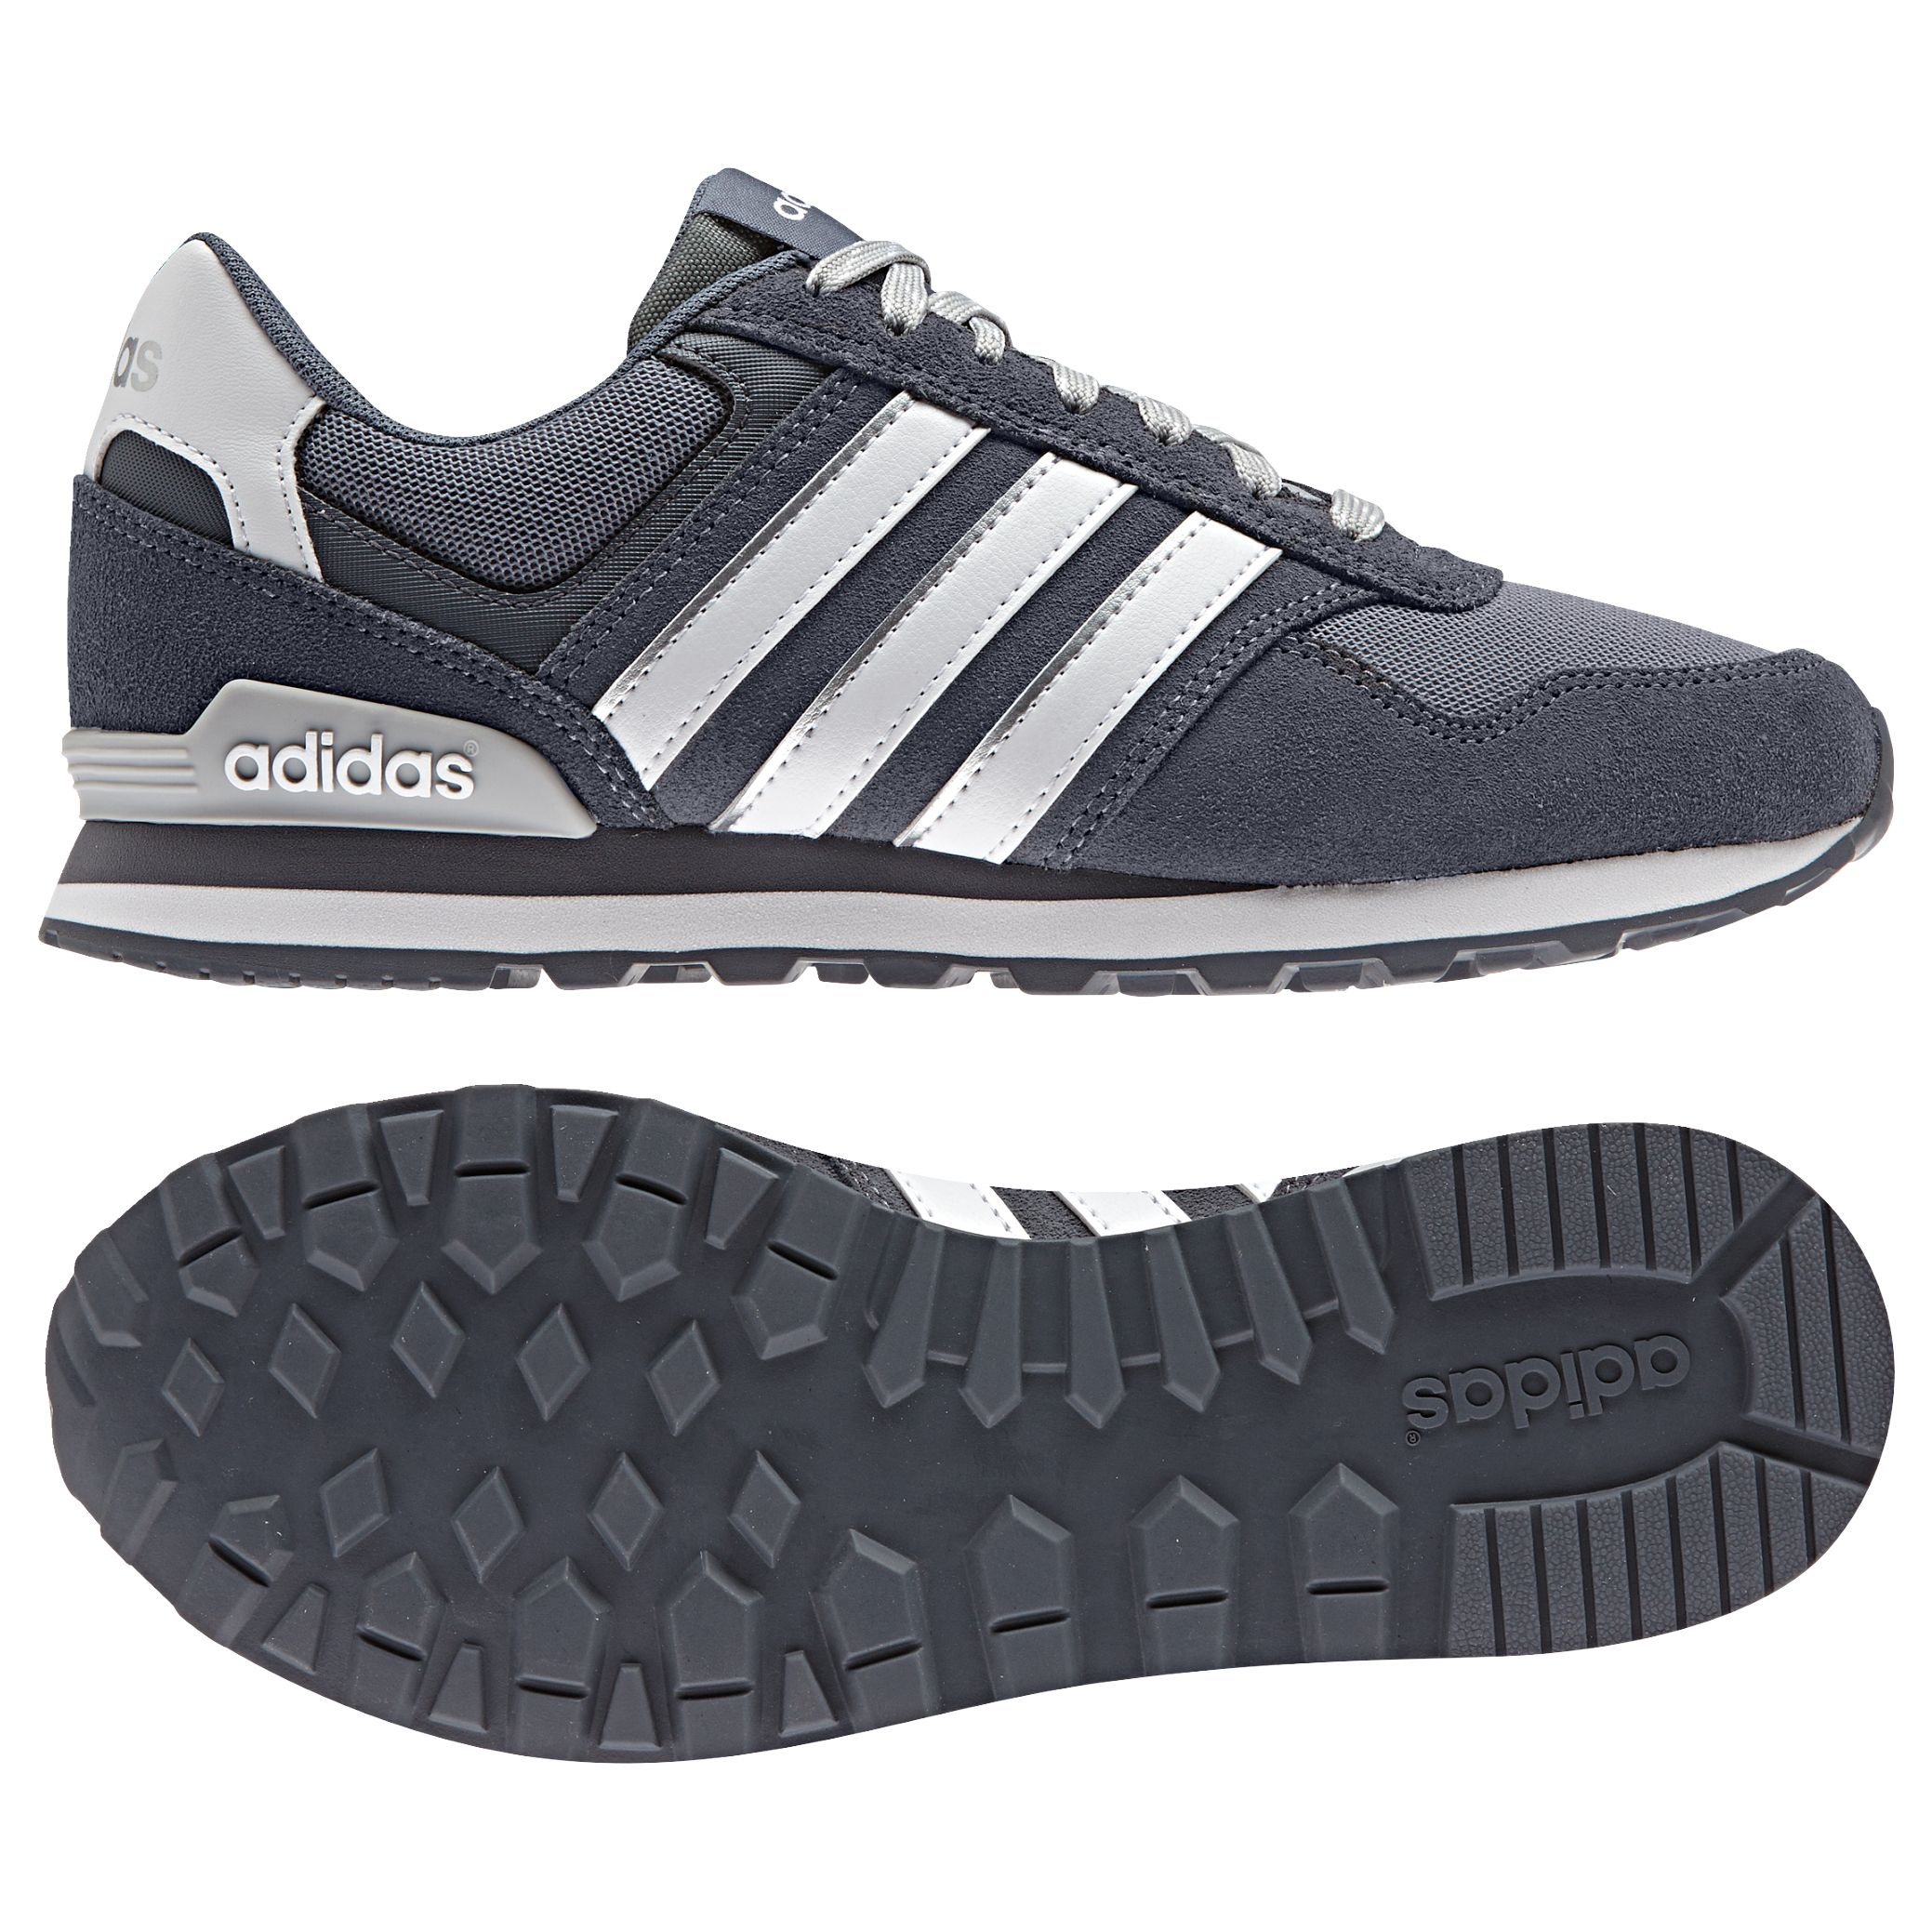 adidas neo trainers